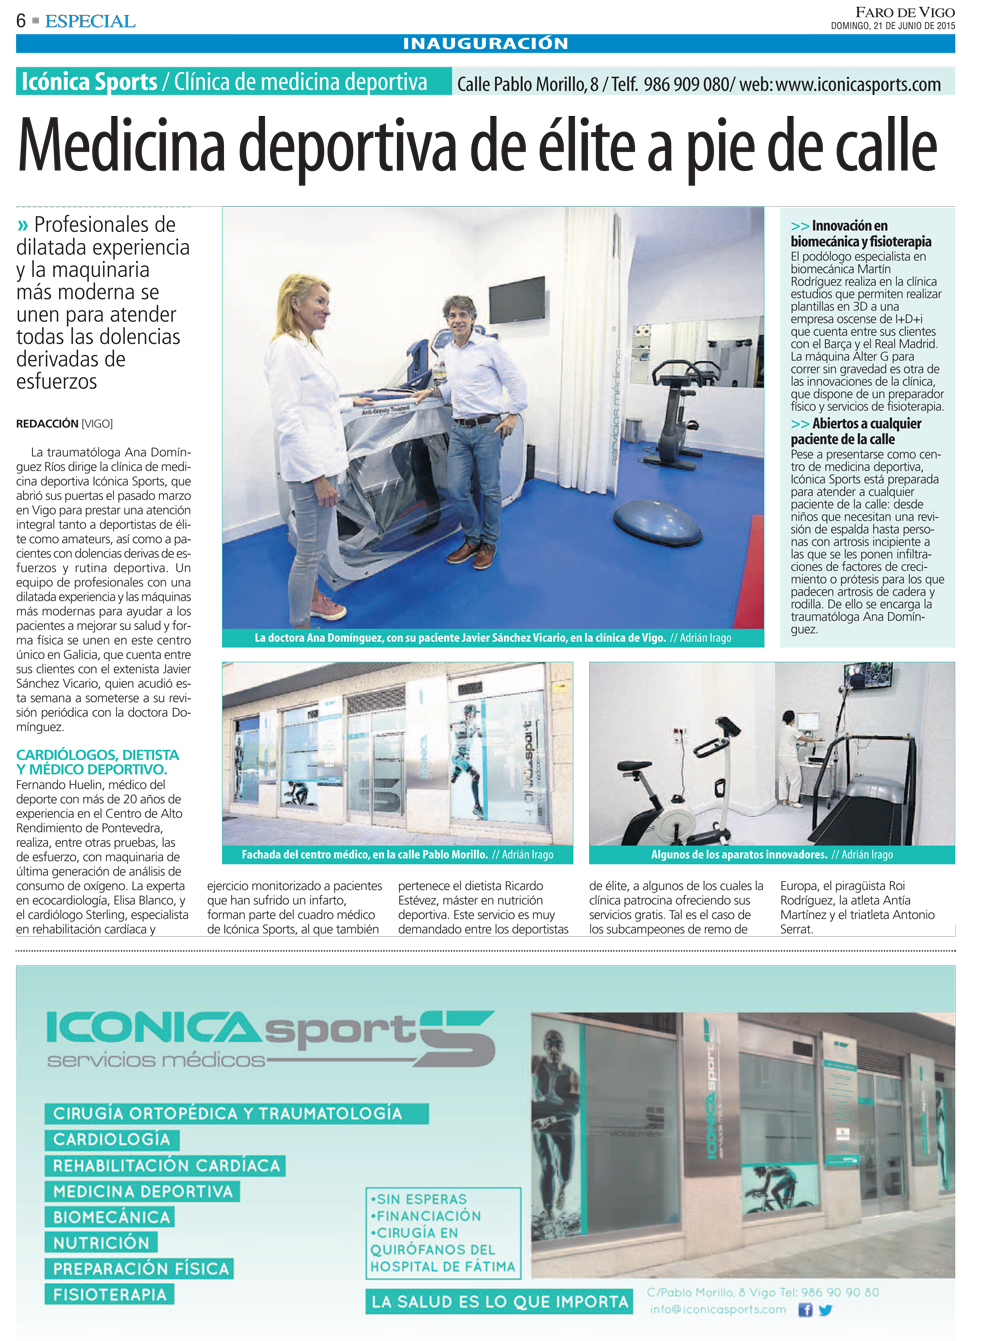 Iconica-Sport-medicina-deportiva-vigo